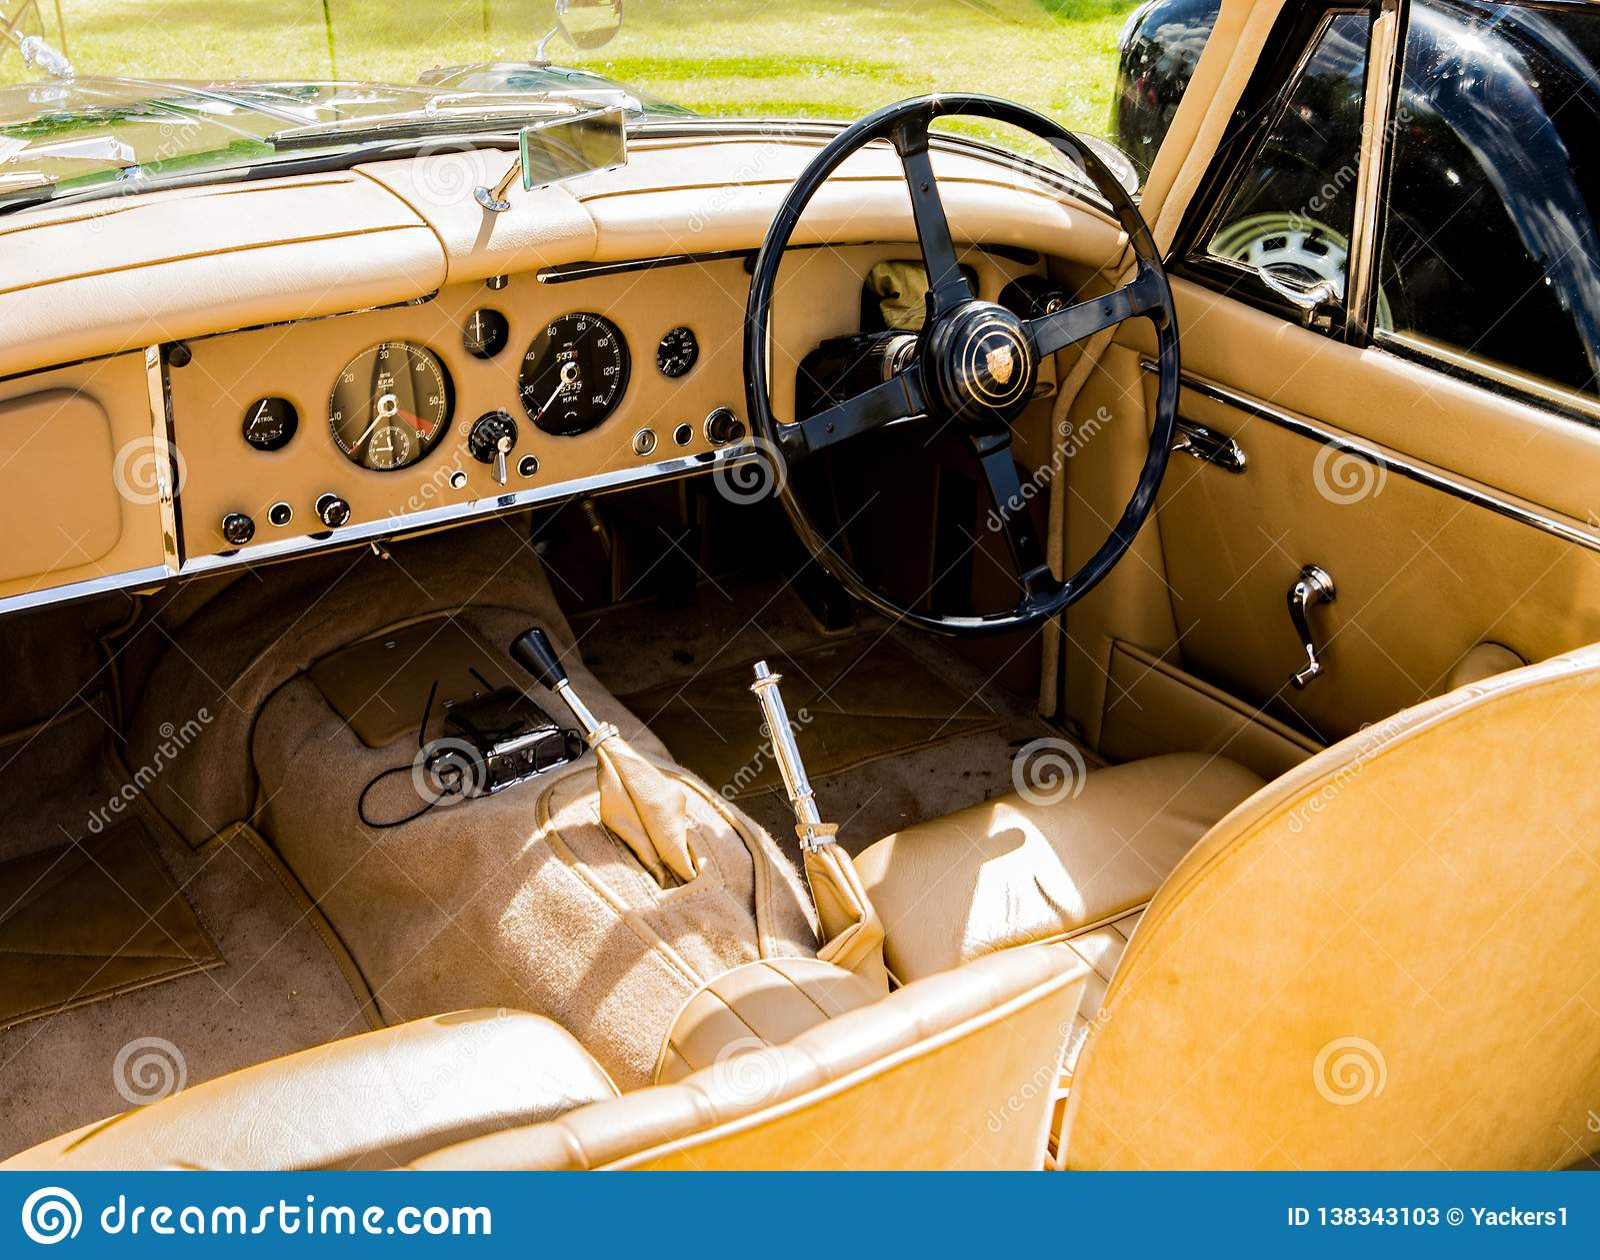 Classic Jaguar Car Leather Interior Editorial Stock Photo Image Of Wheel Beige 138343103